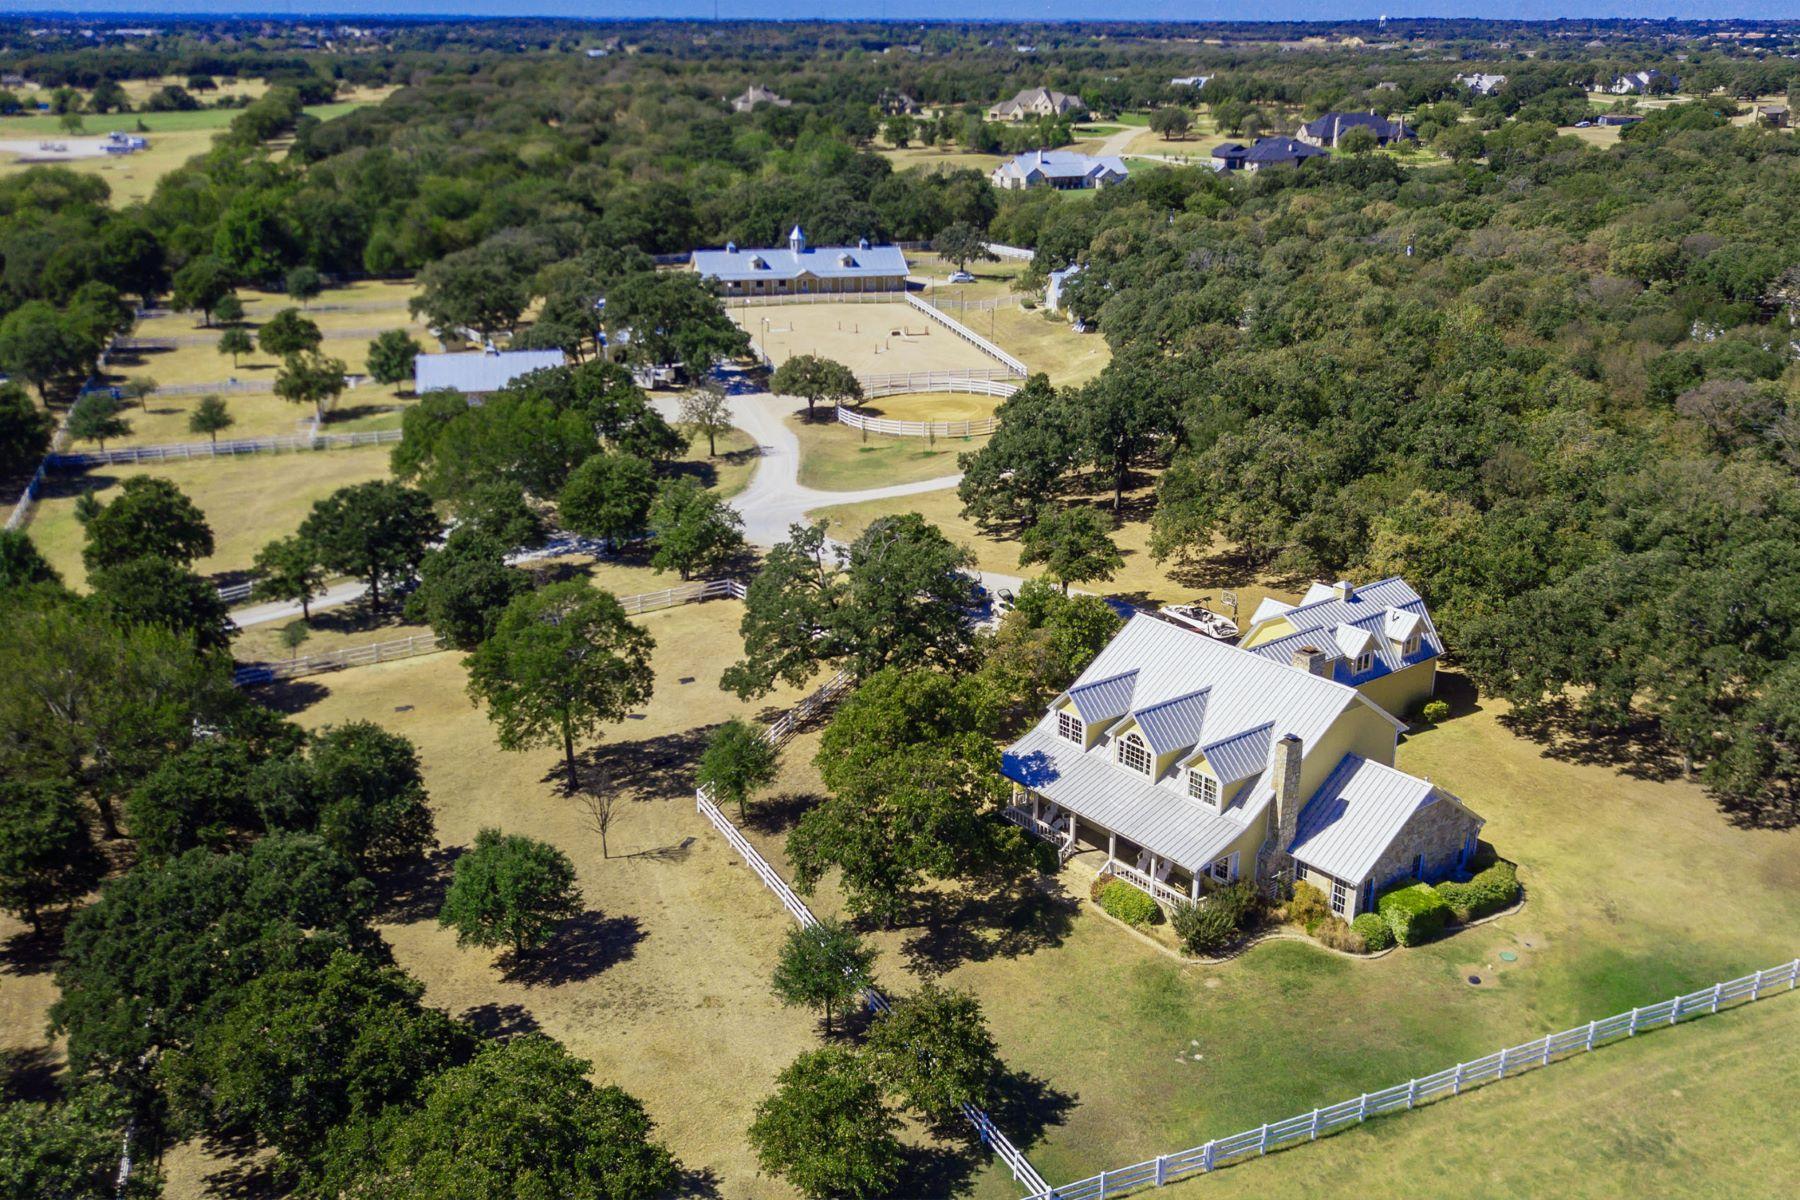 农场 / 牧场 / 种植园 为 销售 在 20 Acre Opportunity in Bartonville Texas 1310 Gibbons Road 巴顿维, 得克萨斯州 76226 美国